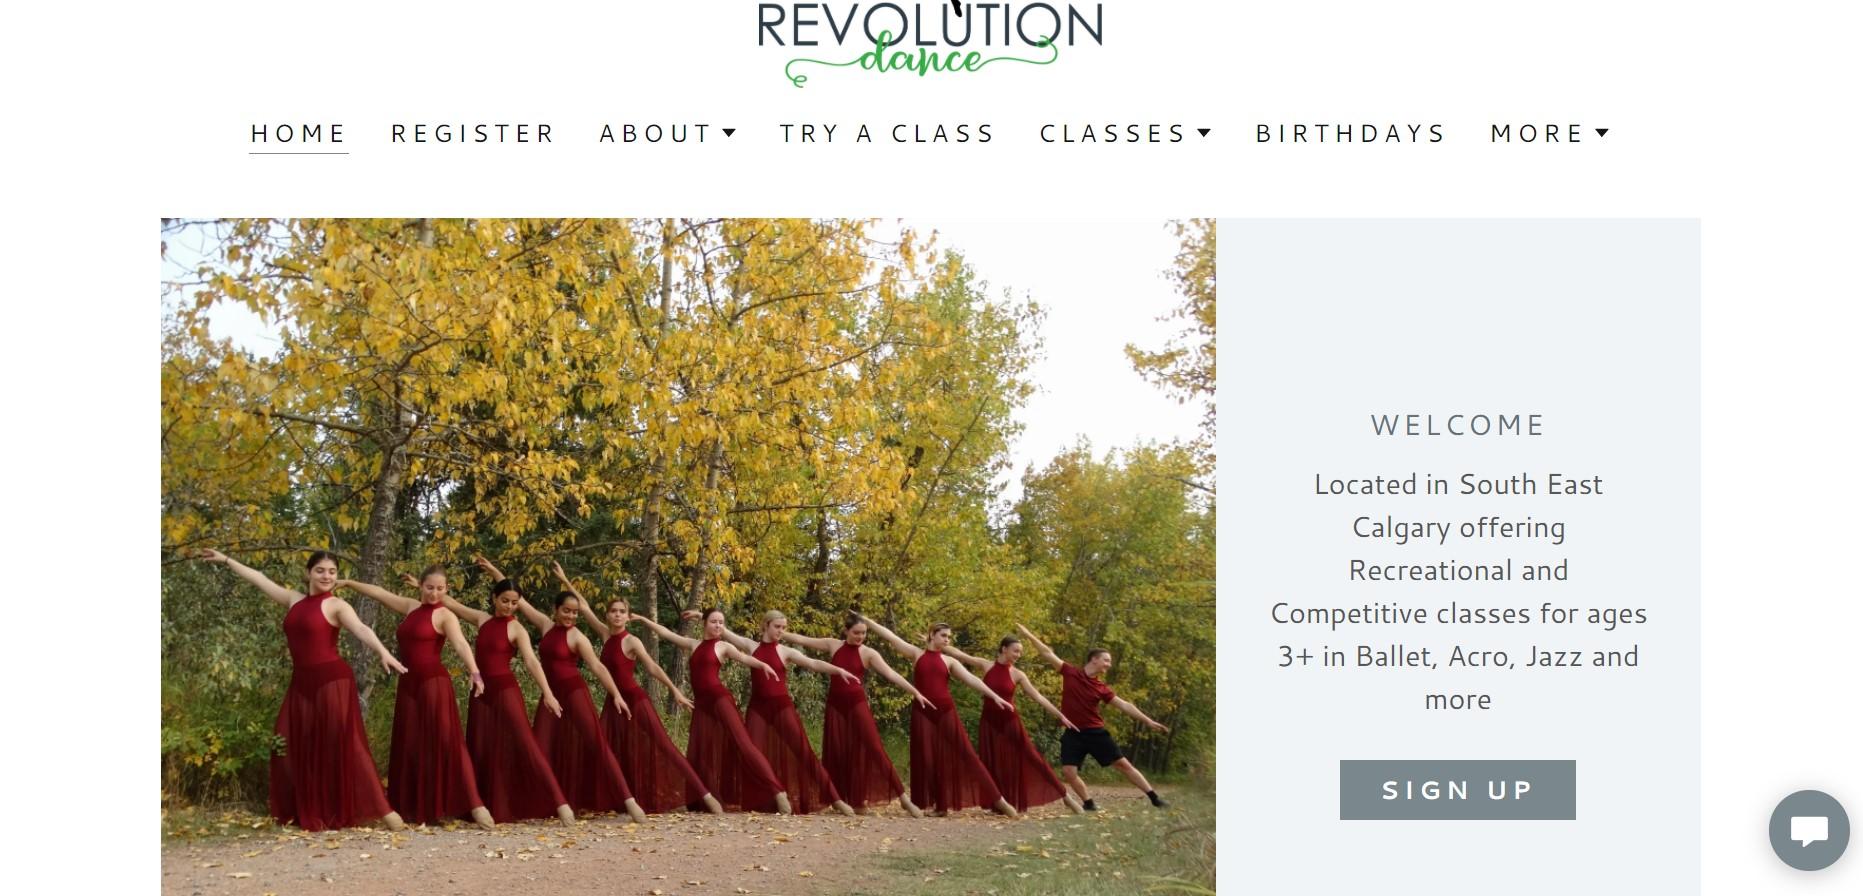 revolution dance instructor in calgary